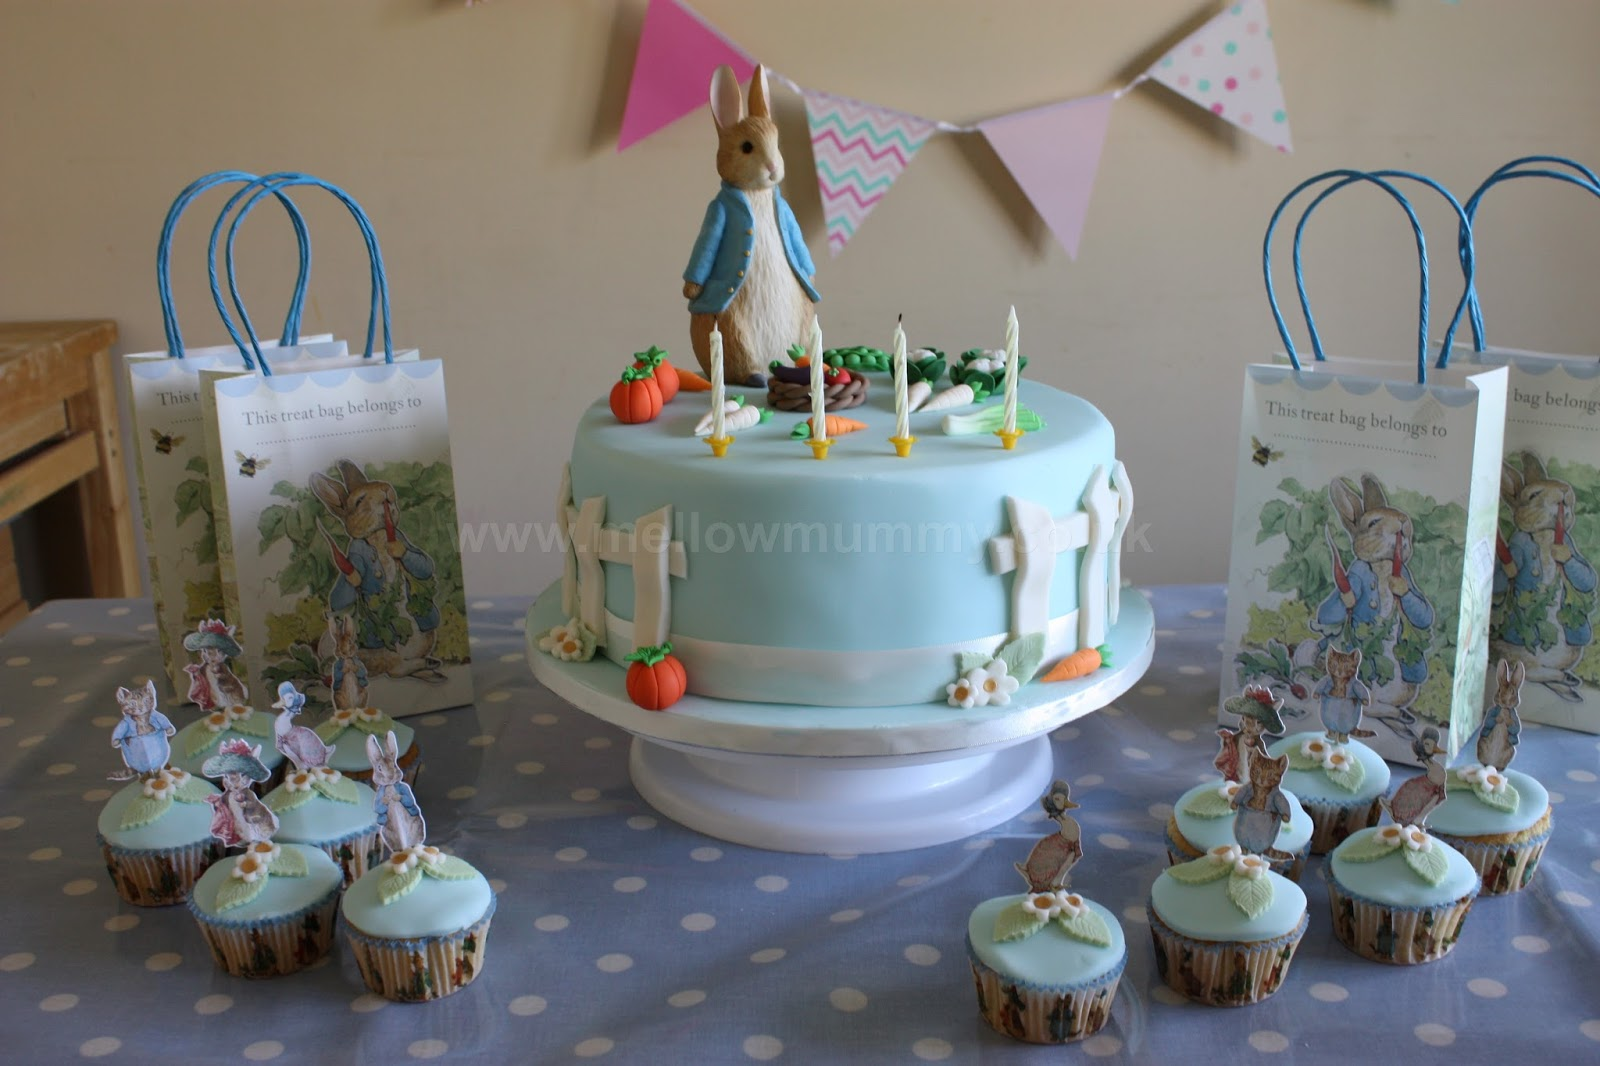 Mellow Mummy The Peter Rabbit Birthday Cake Taking Life As It